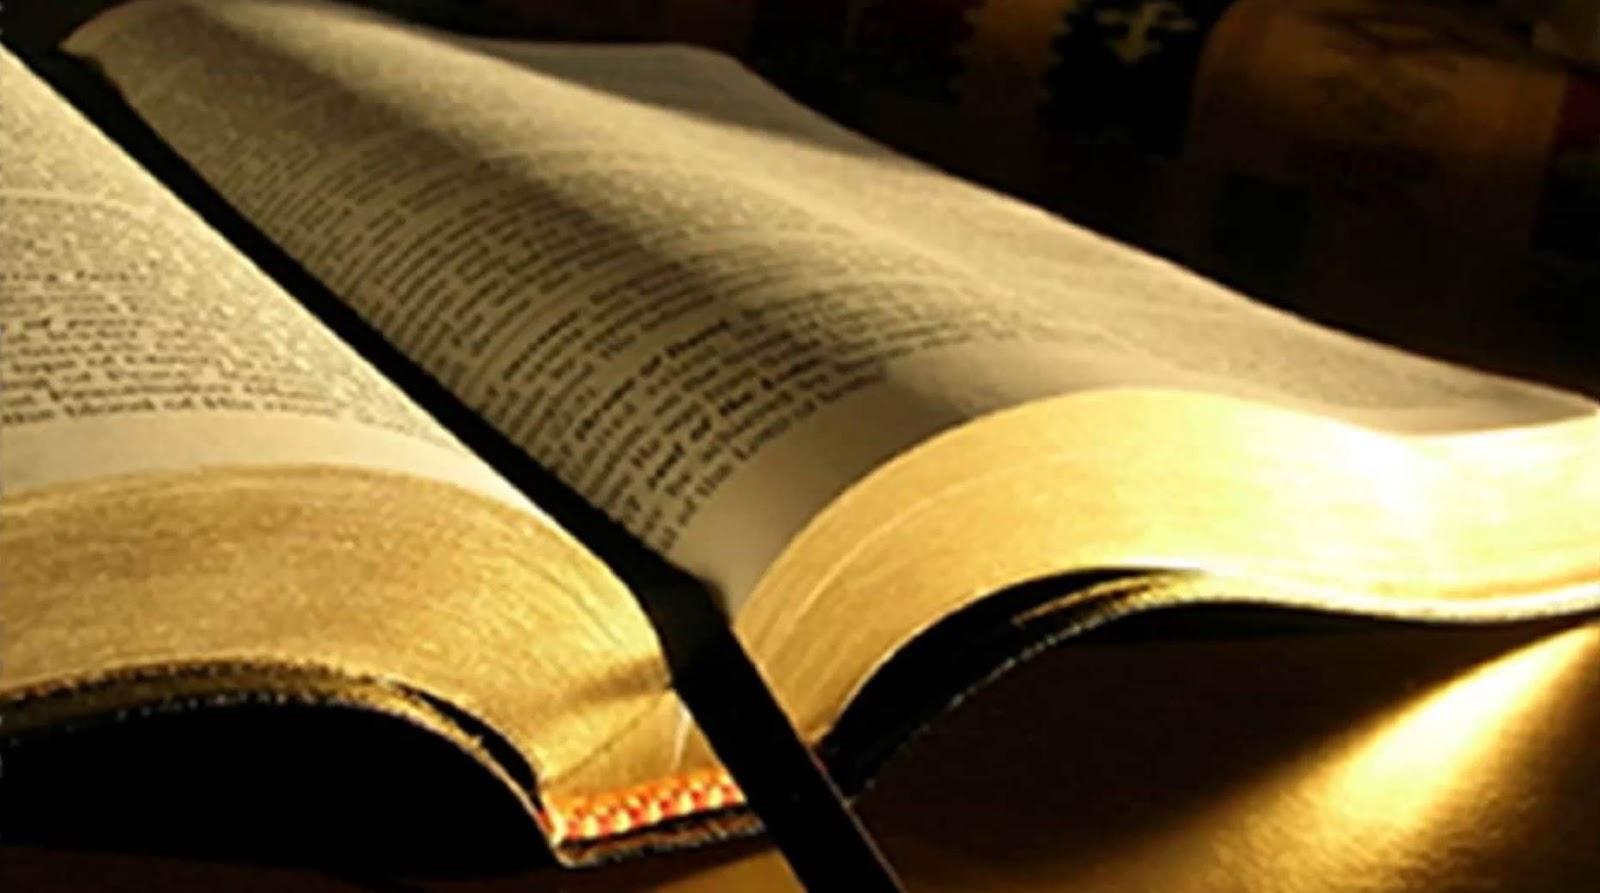 Palavra de Deus: Útil para Instruir em Justiça